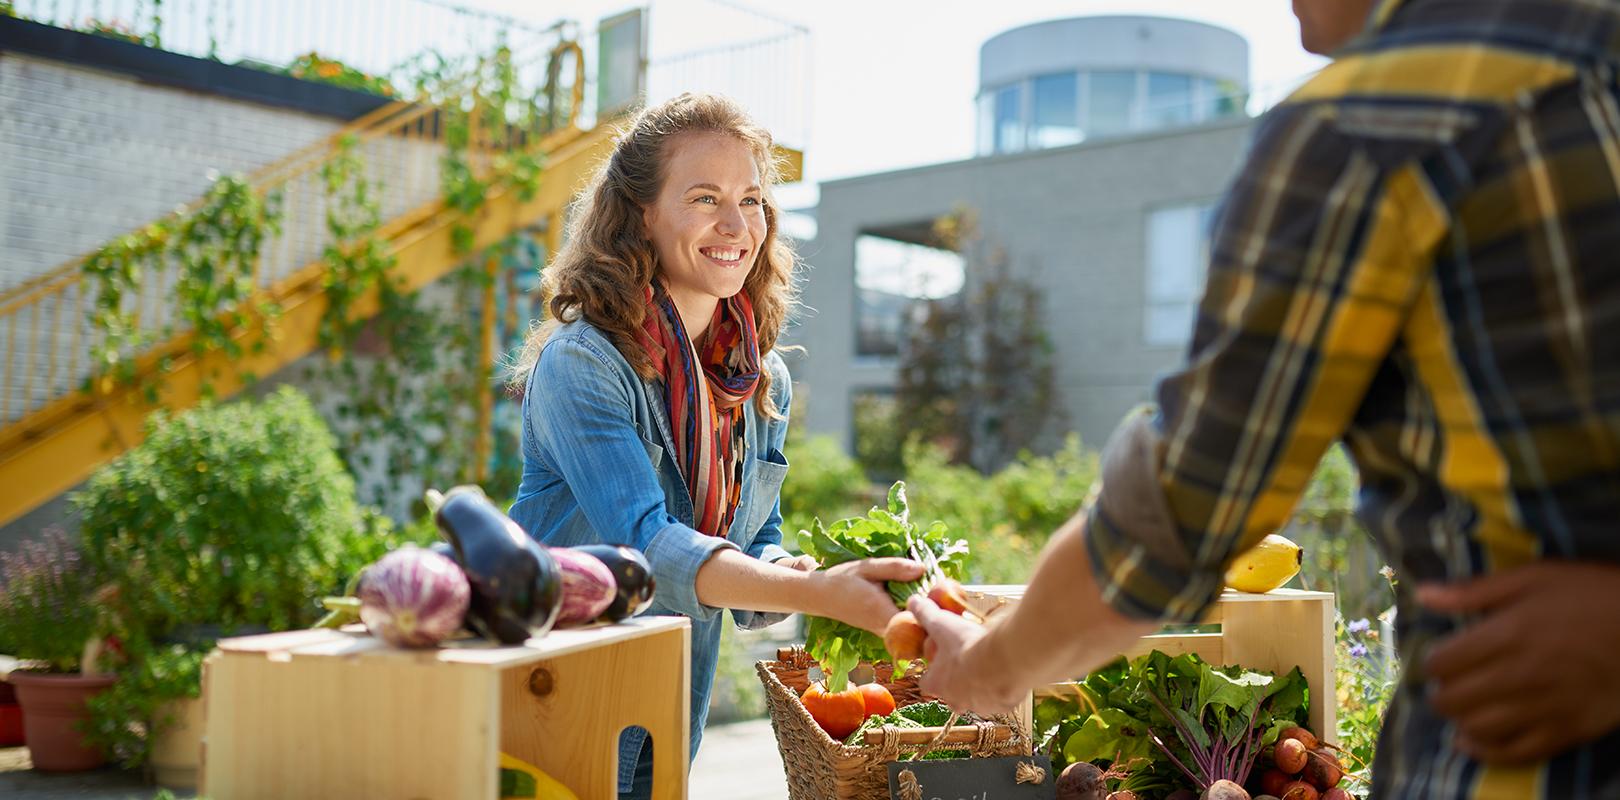 transition-alimentaire-priorite-pour-civilisation